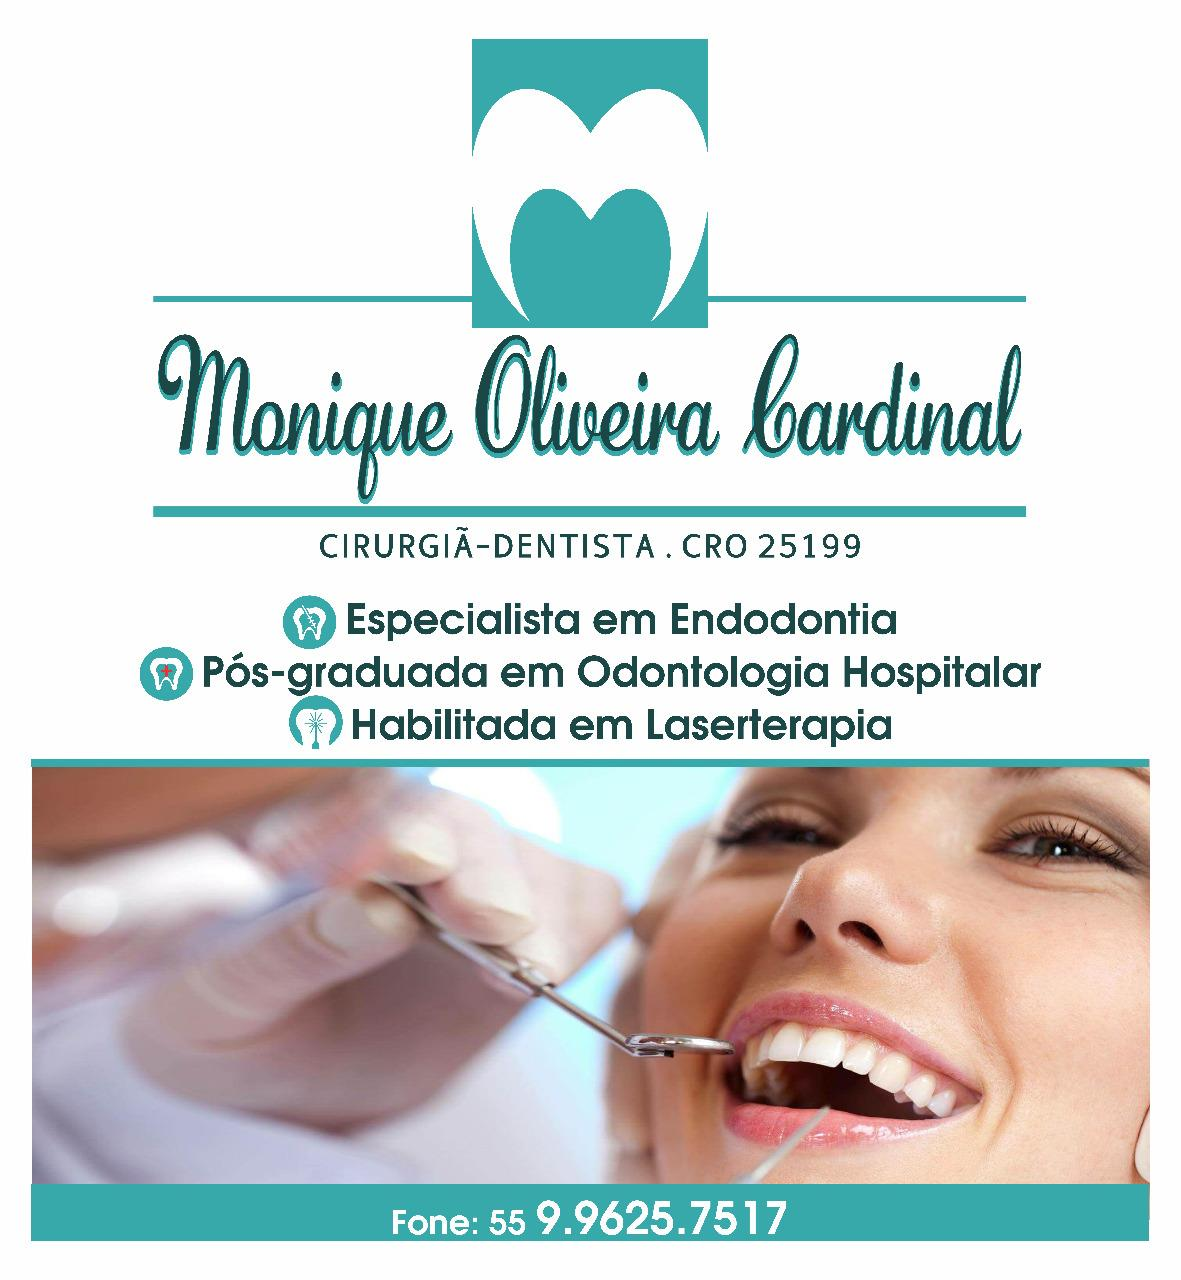 Monique Oliveira Cardinal Odontologia